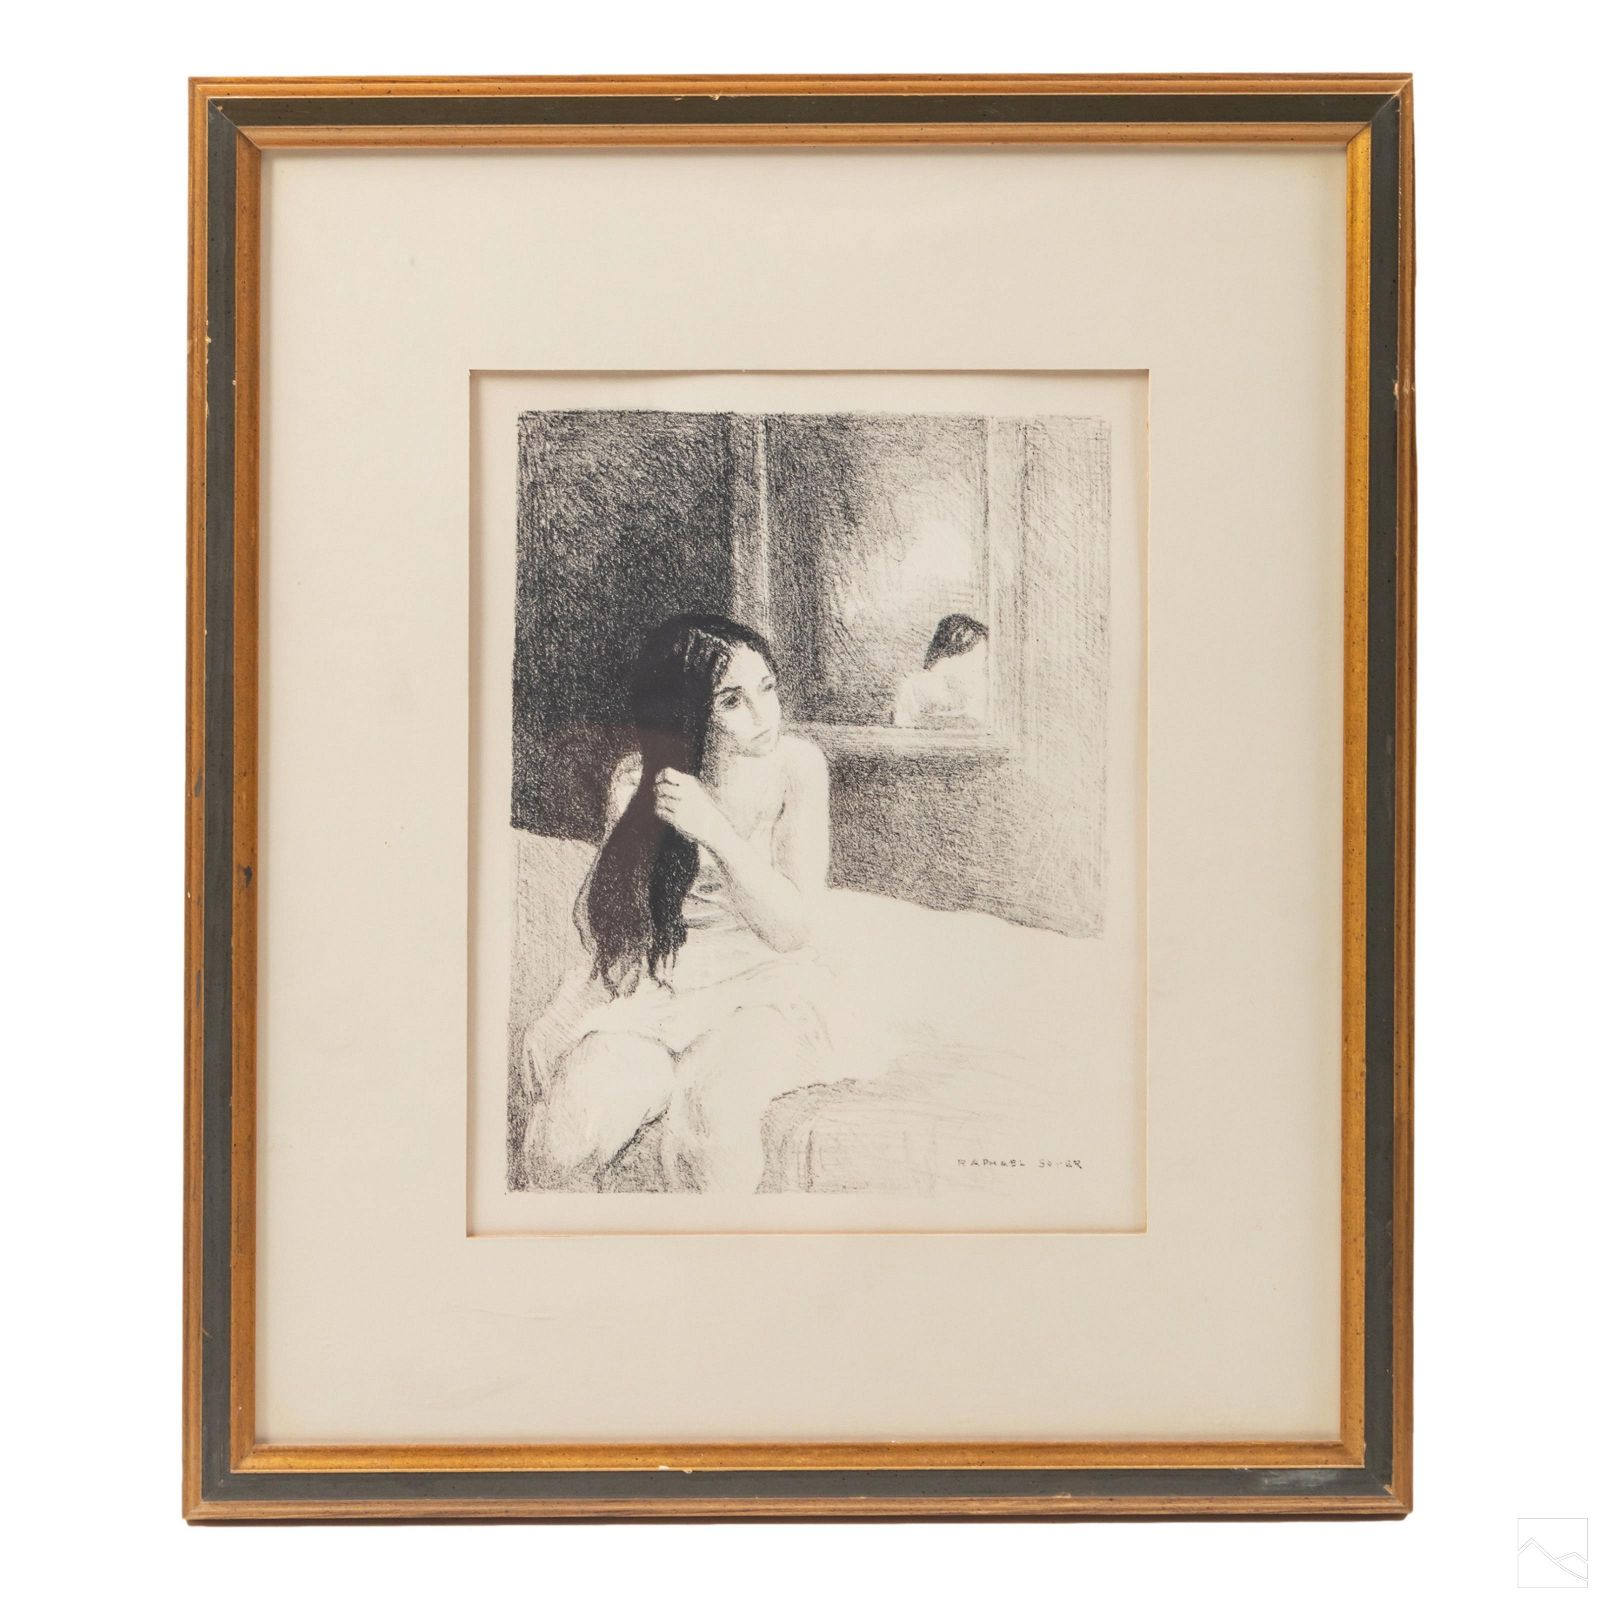 20C. Modern Art Portrait Litho after Raphael Soyer